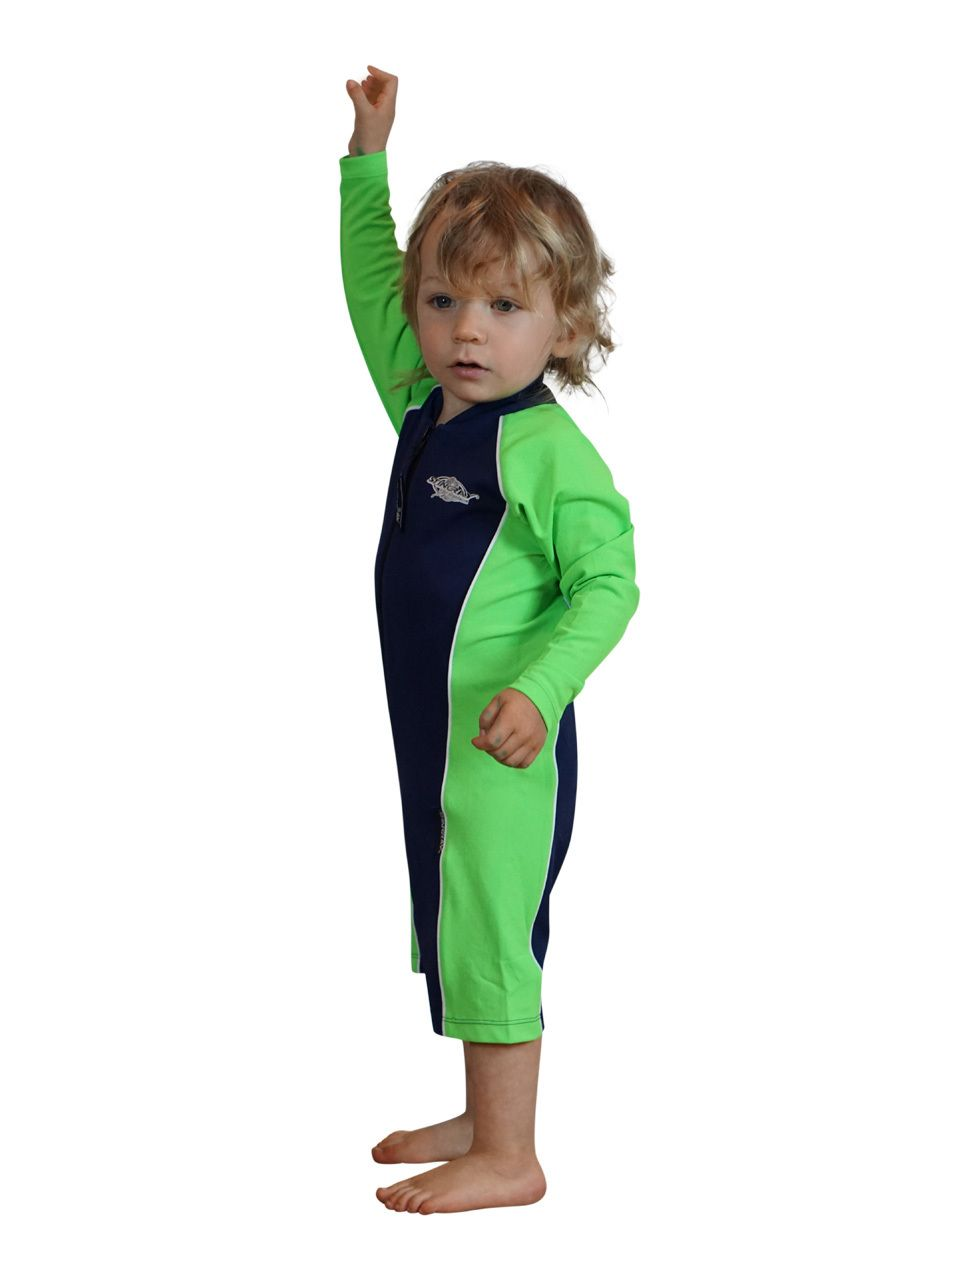 17f388c59d060 Solartex Sun Gear - Baby / Toddler Girls UV Swimsuits - Long Sleeves - Stingray-